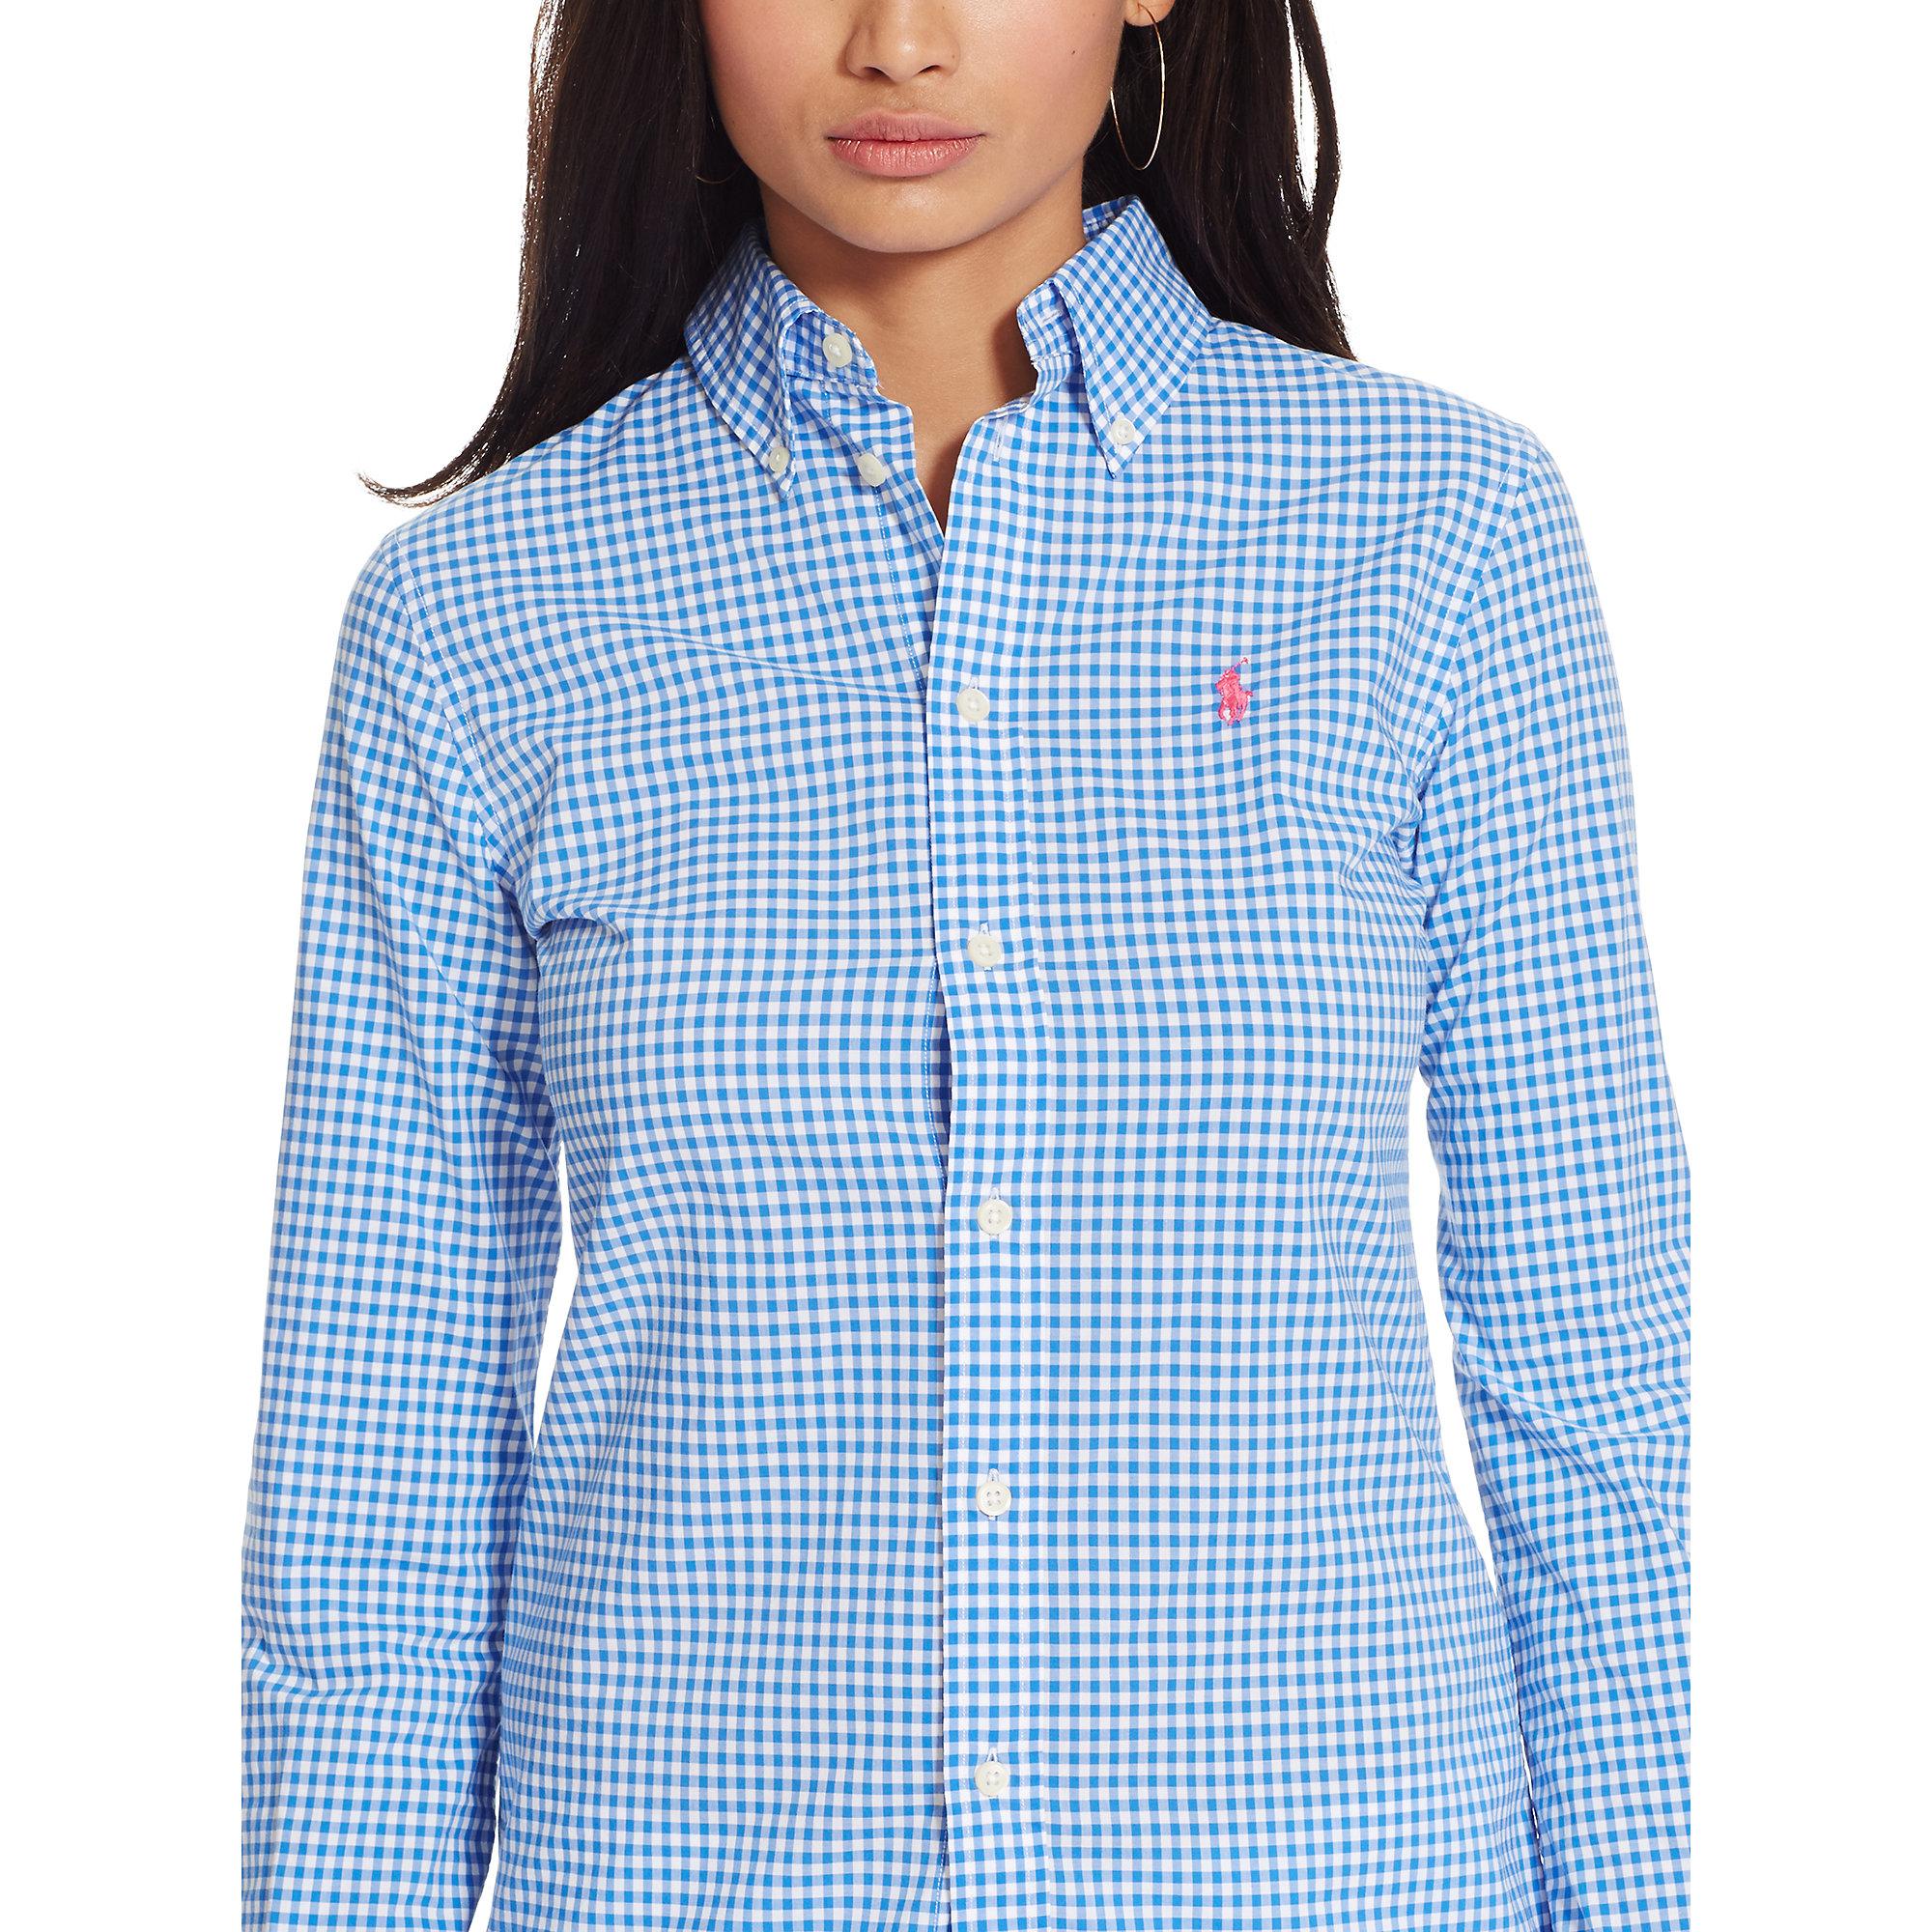 1b85c8378f8 clearance ralph lauren red and white checkered shirt cheap f97c4 ae8e1